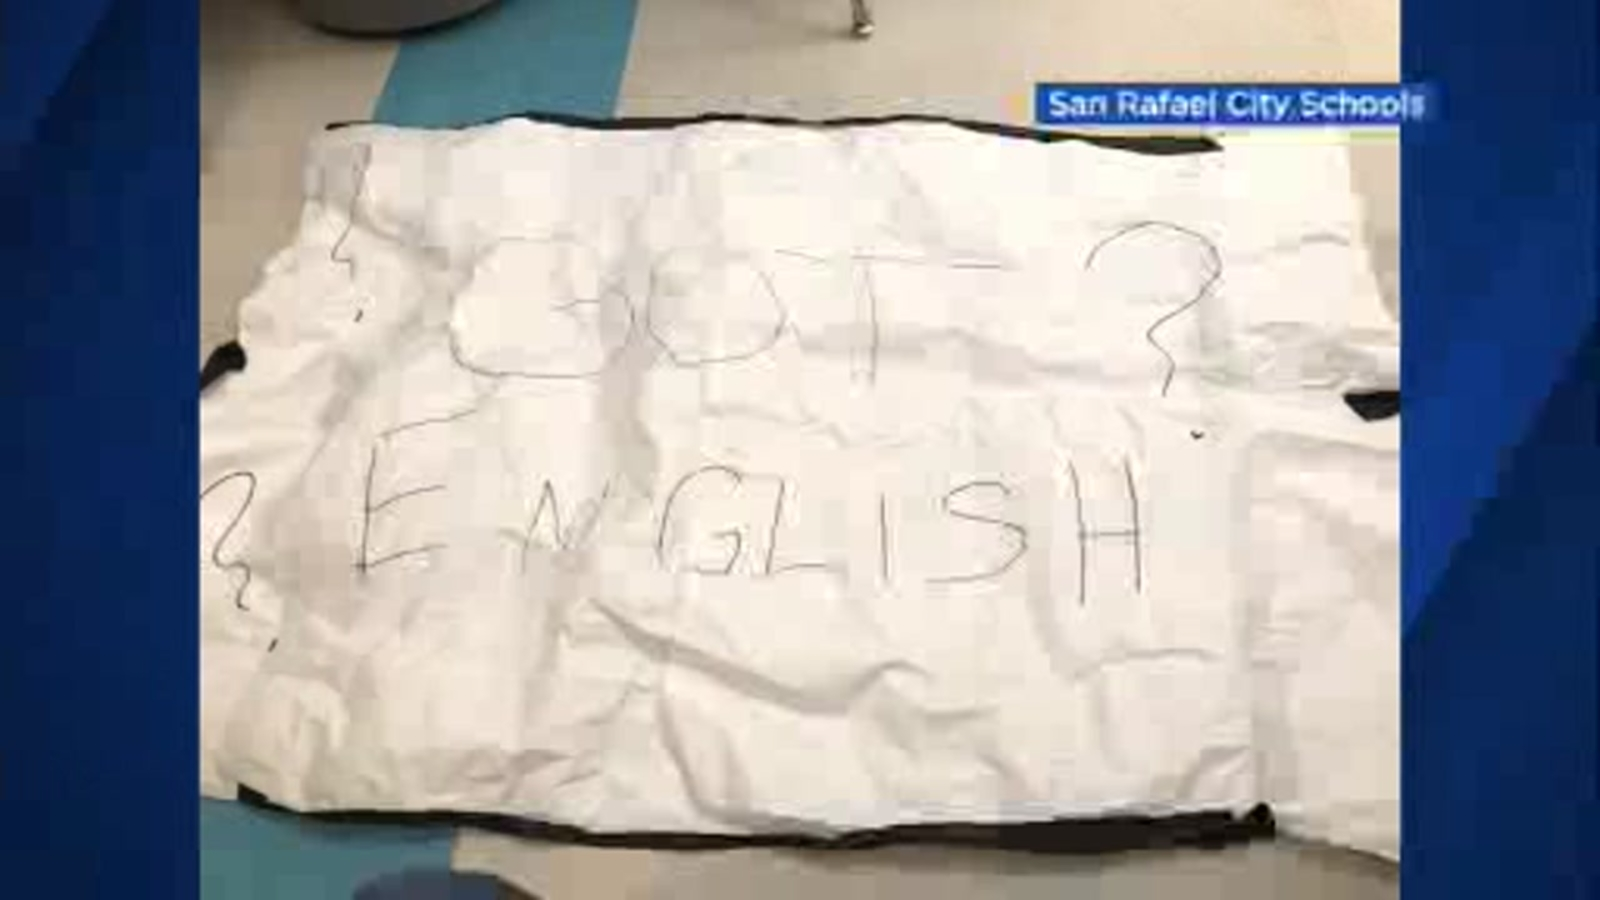 'Got English?' sign posted at San Pedro Elementary School in San Rafael